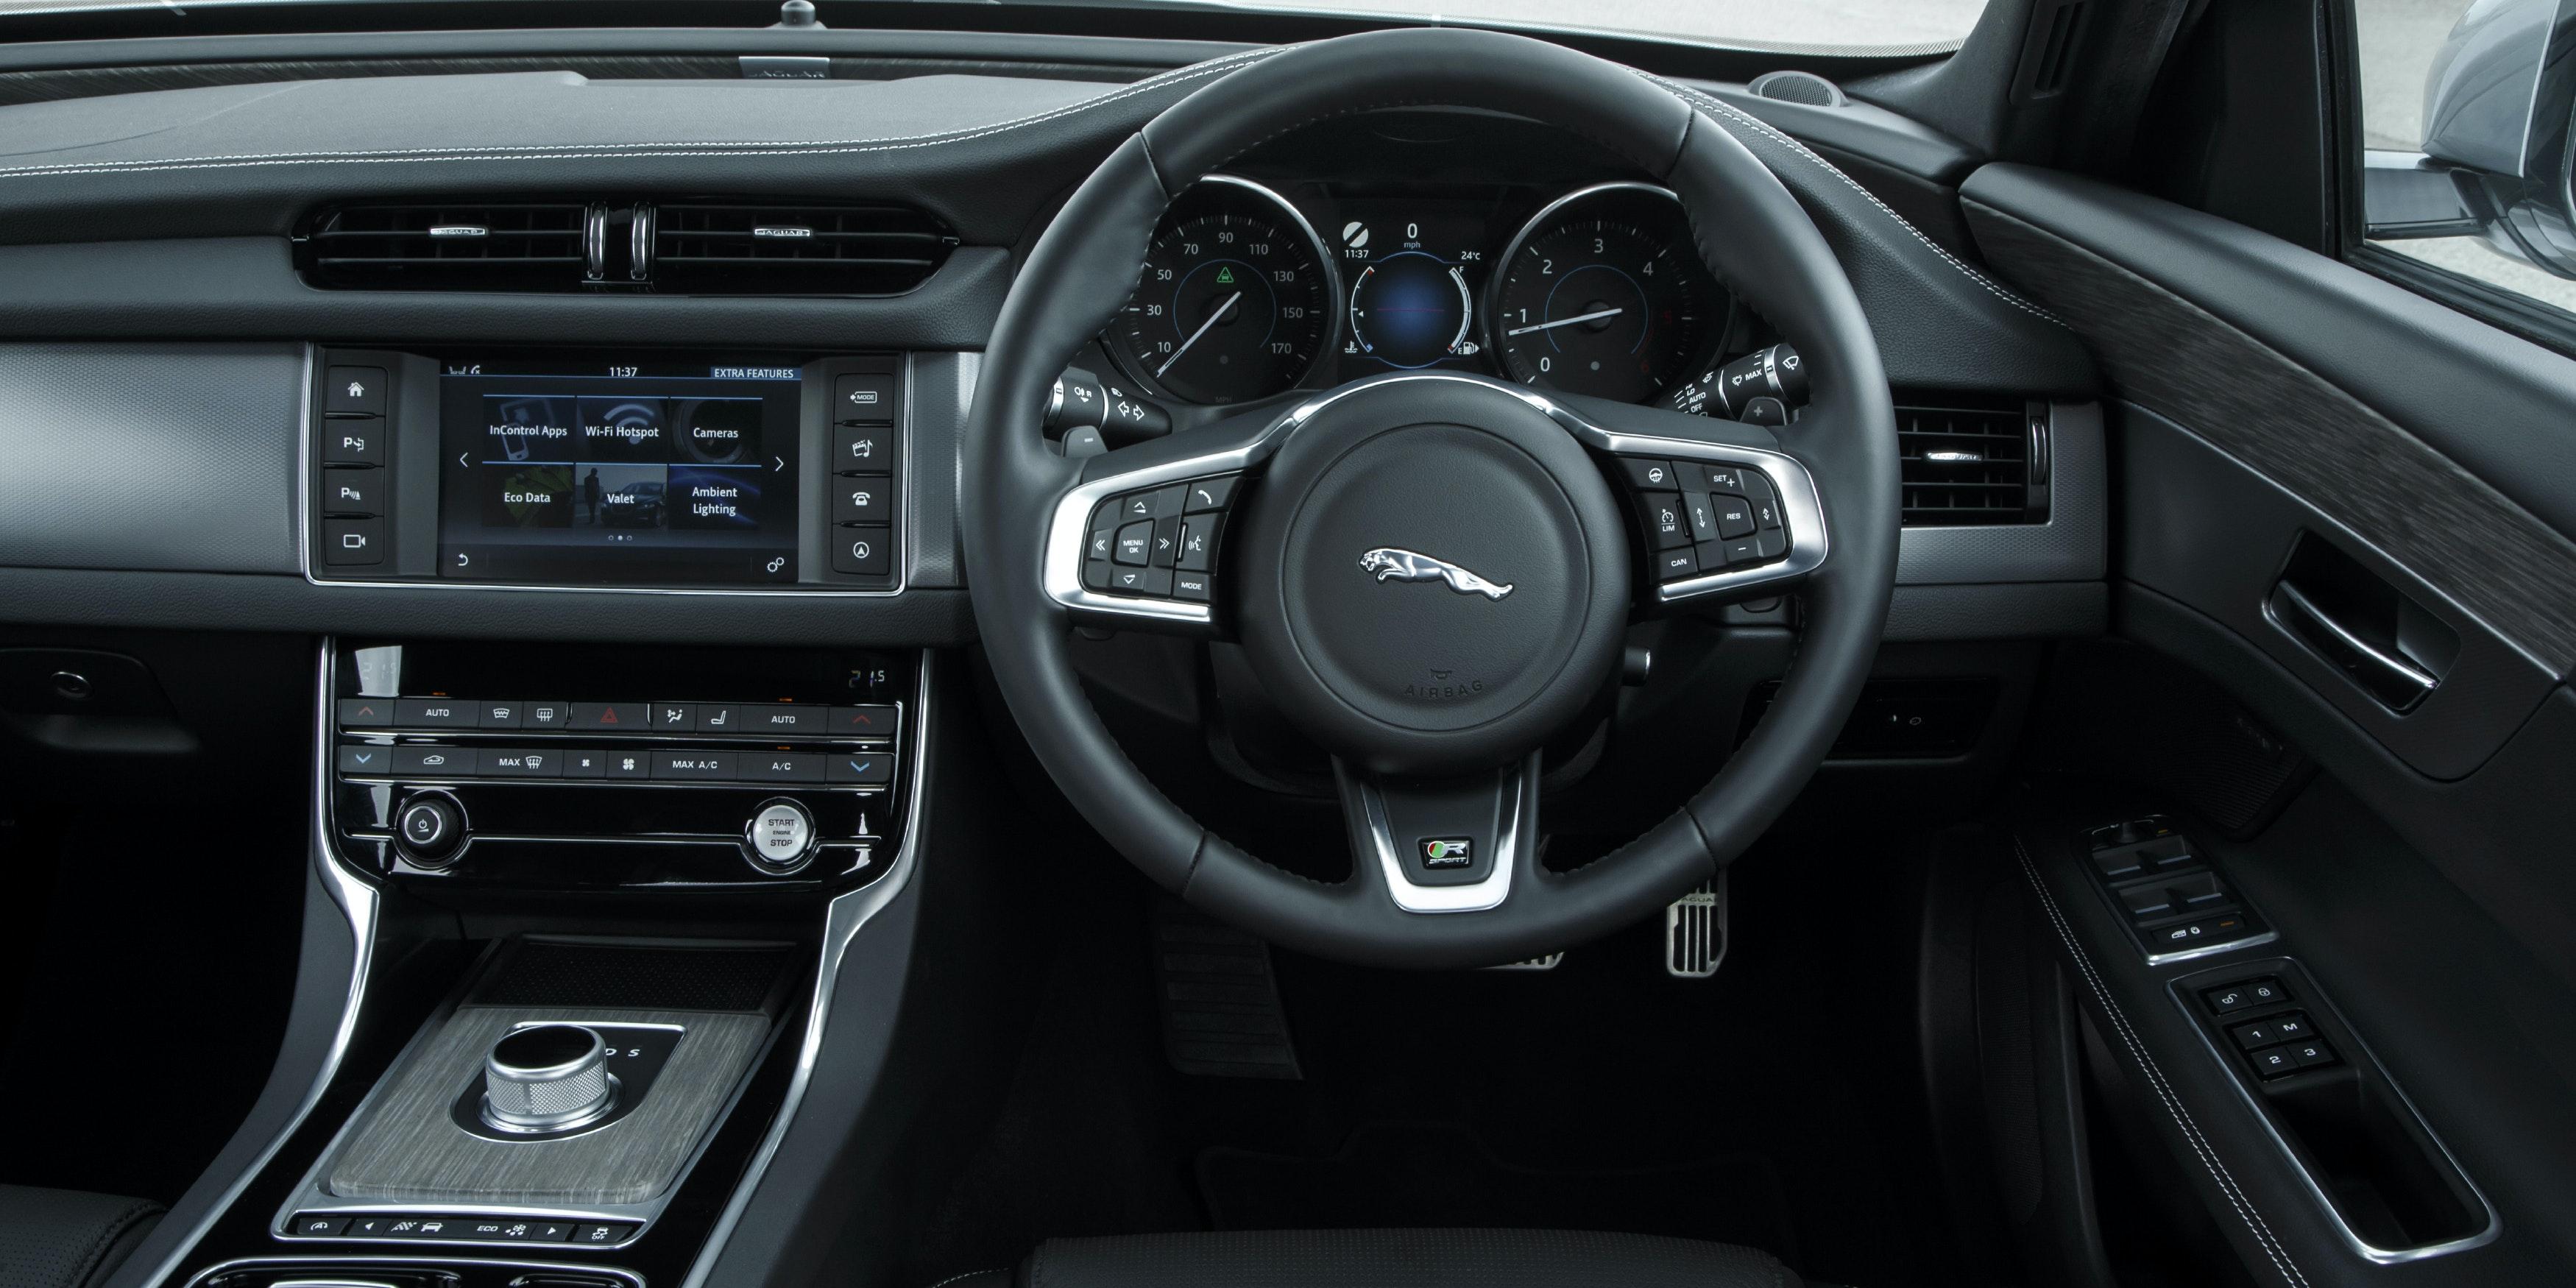 Jaguar XF Interior U0026 Infotainment | Carwow